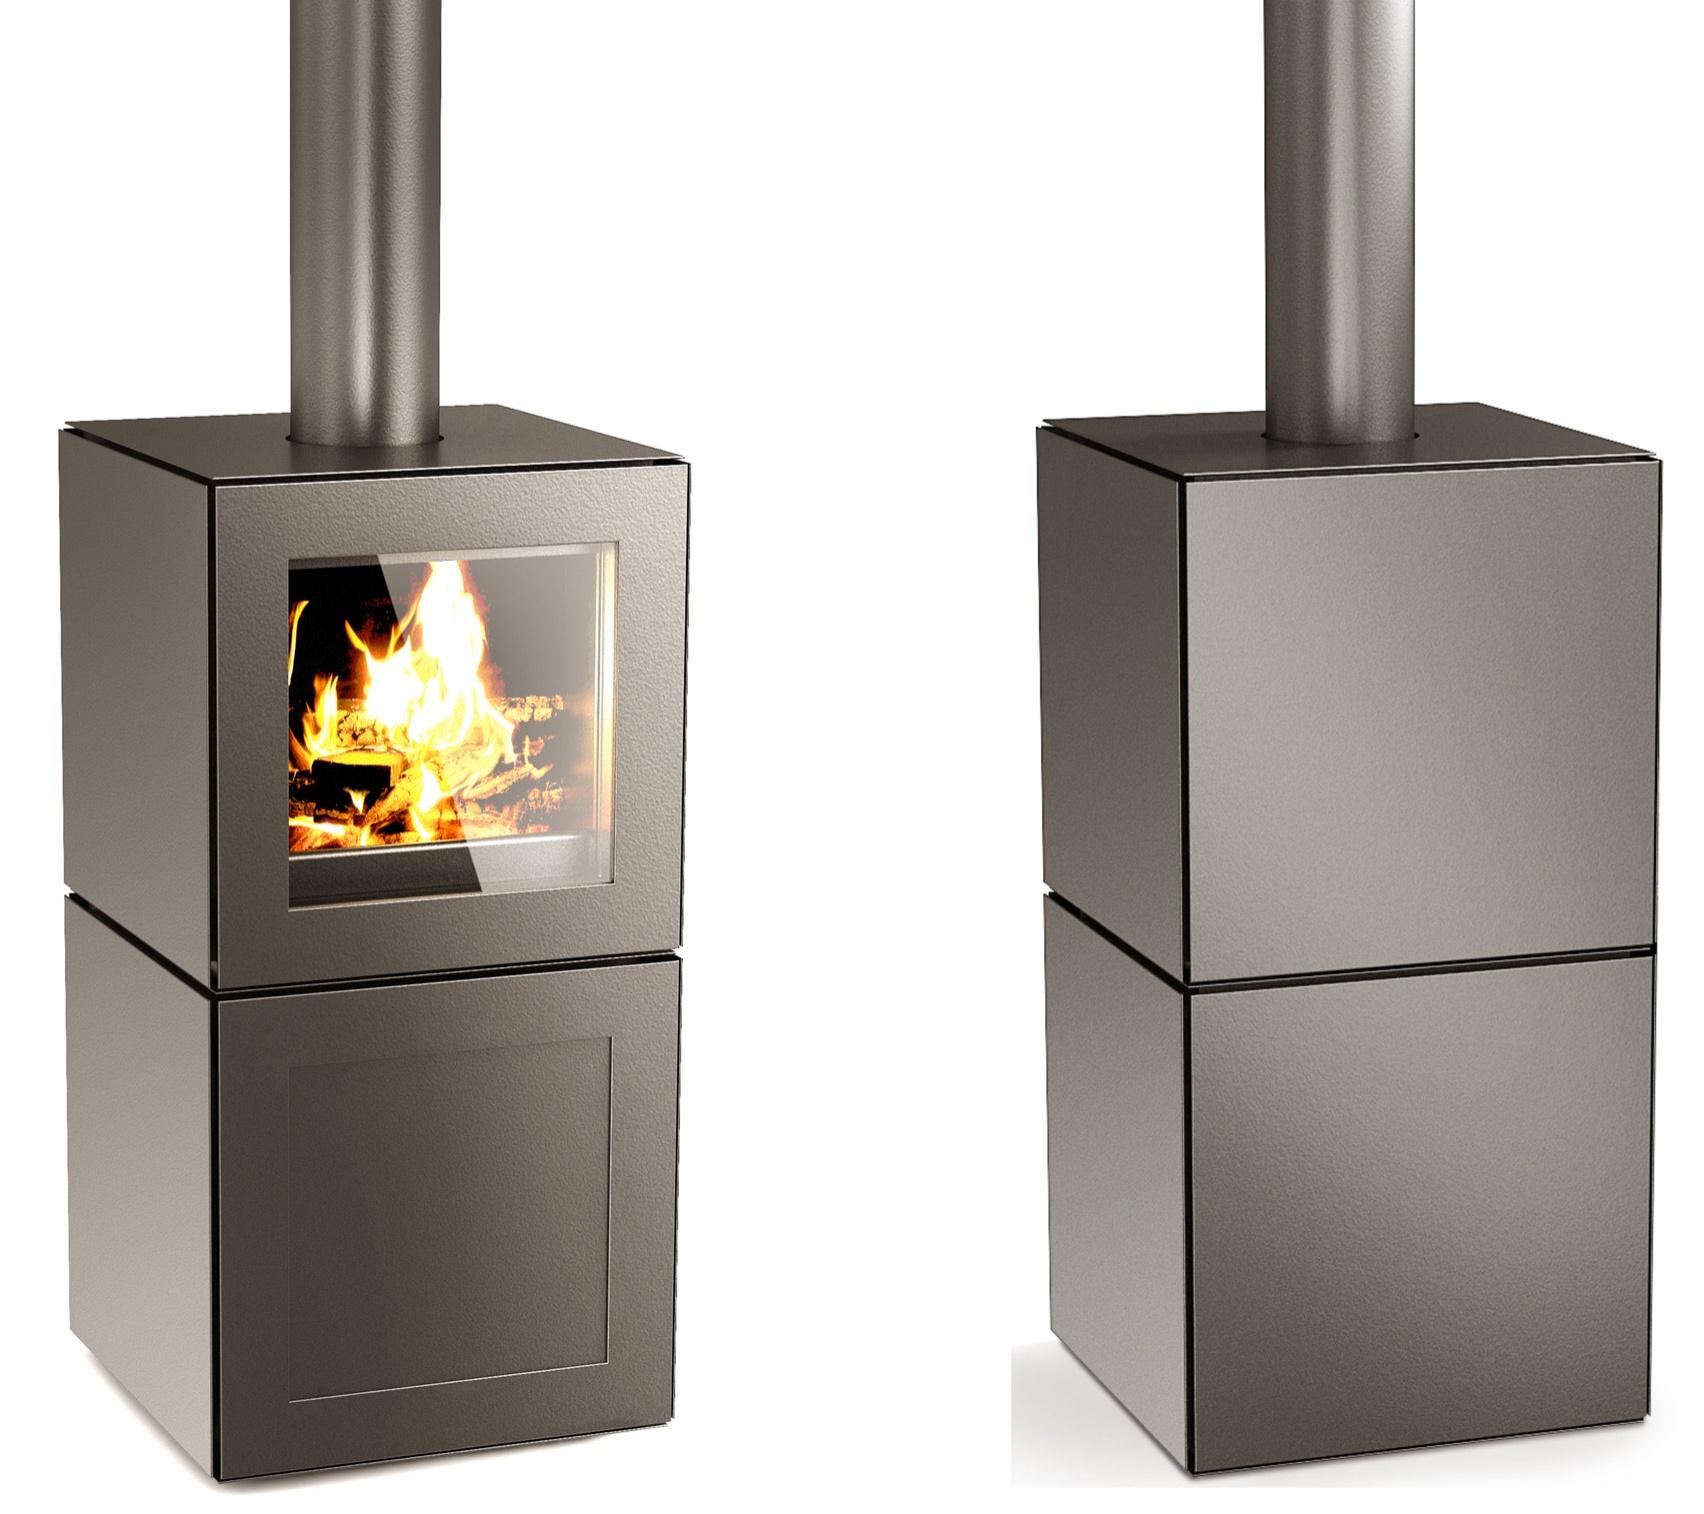 speetbox-customisable-wood-burning-stove-starck_dezeen_1704_col_14